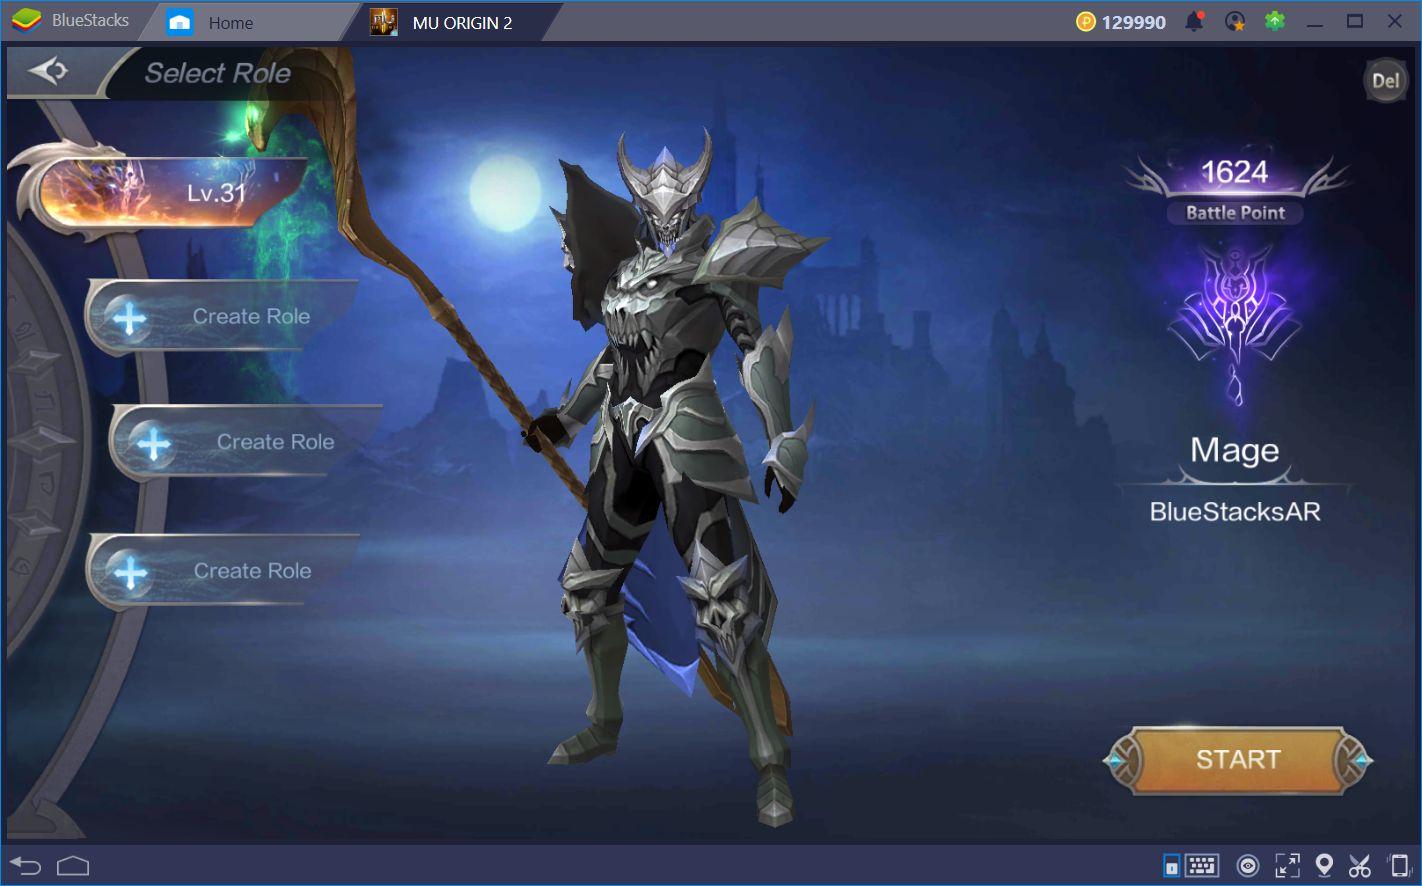 MU Origin 2—The Famous MMORPG Gets a New Look! | BlueStacks 4